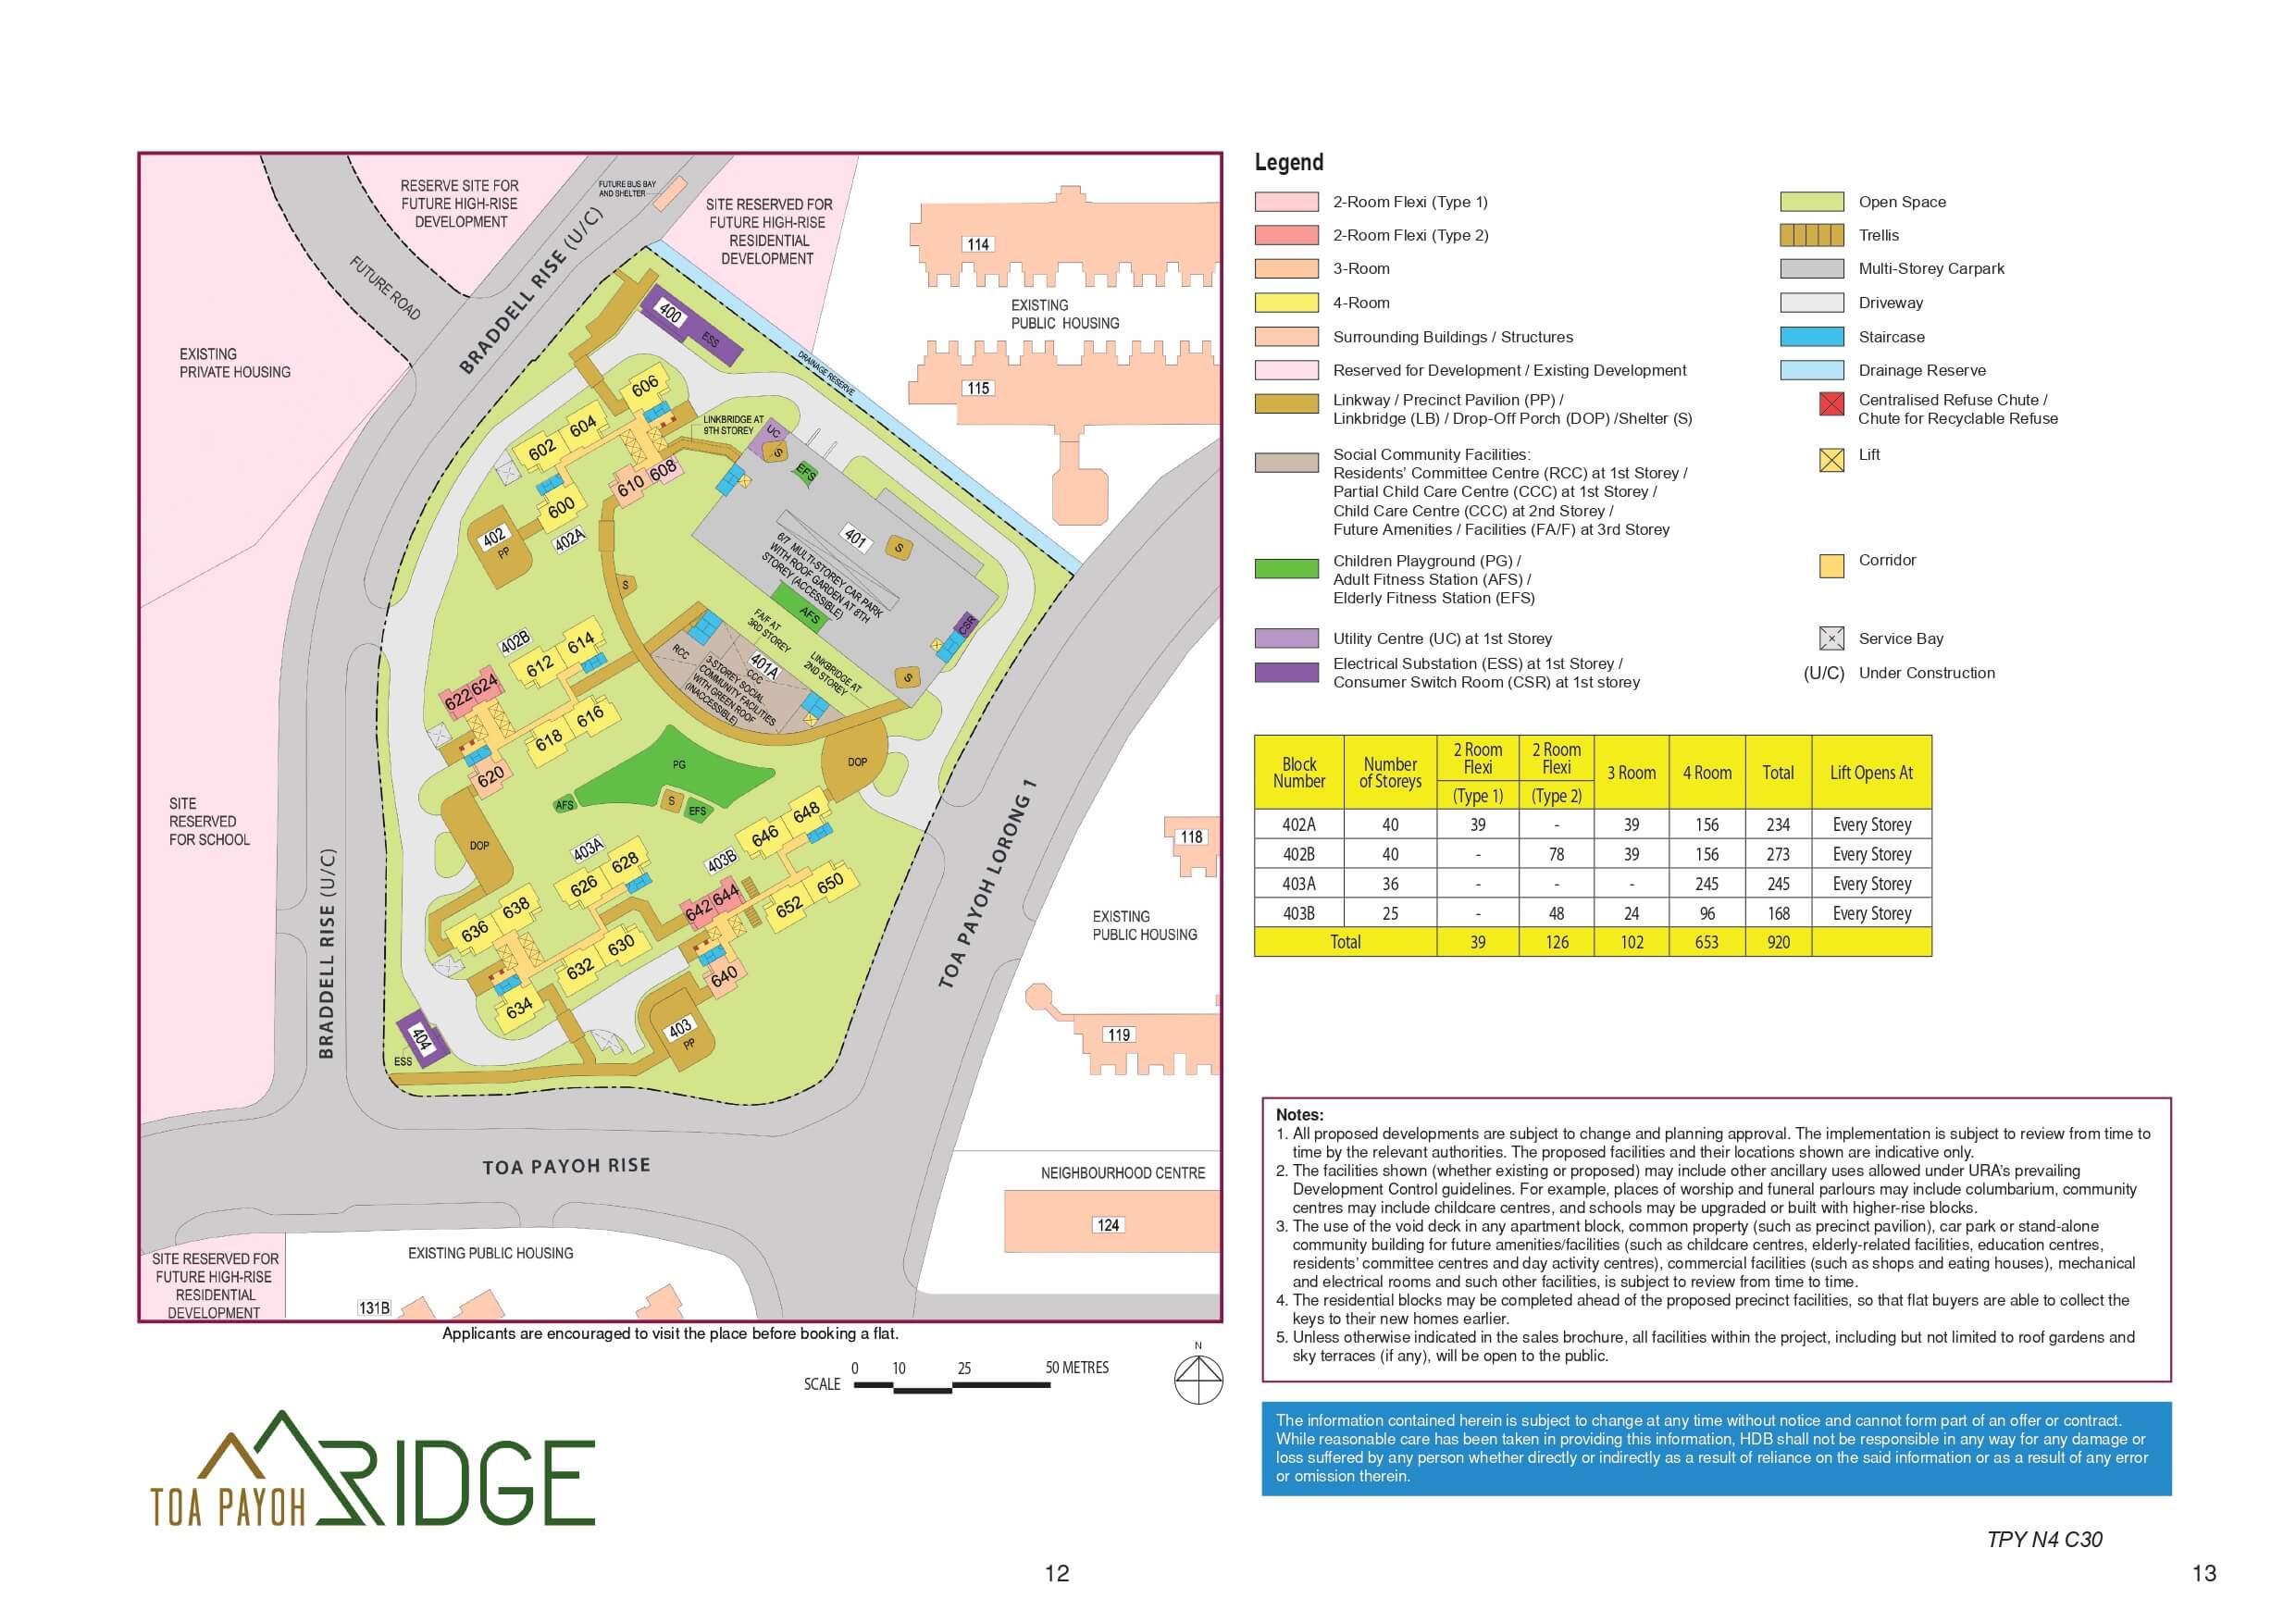 Toa Payoh Ridge Site Plan